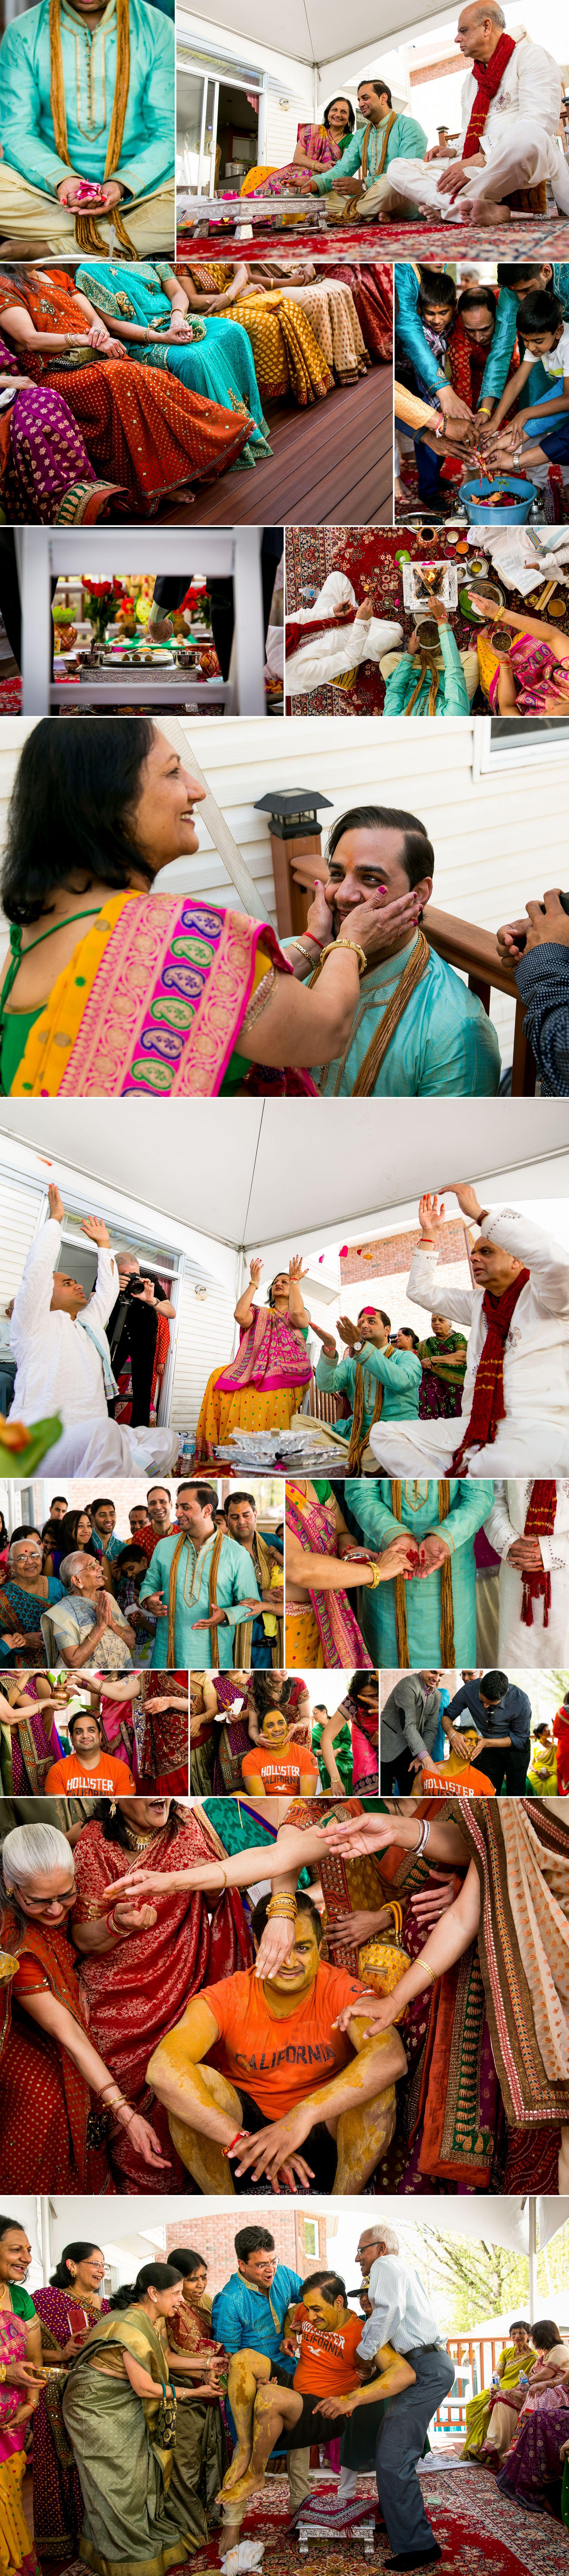 Groom's side Hindu wedding ceremony